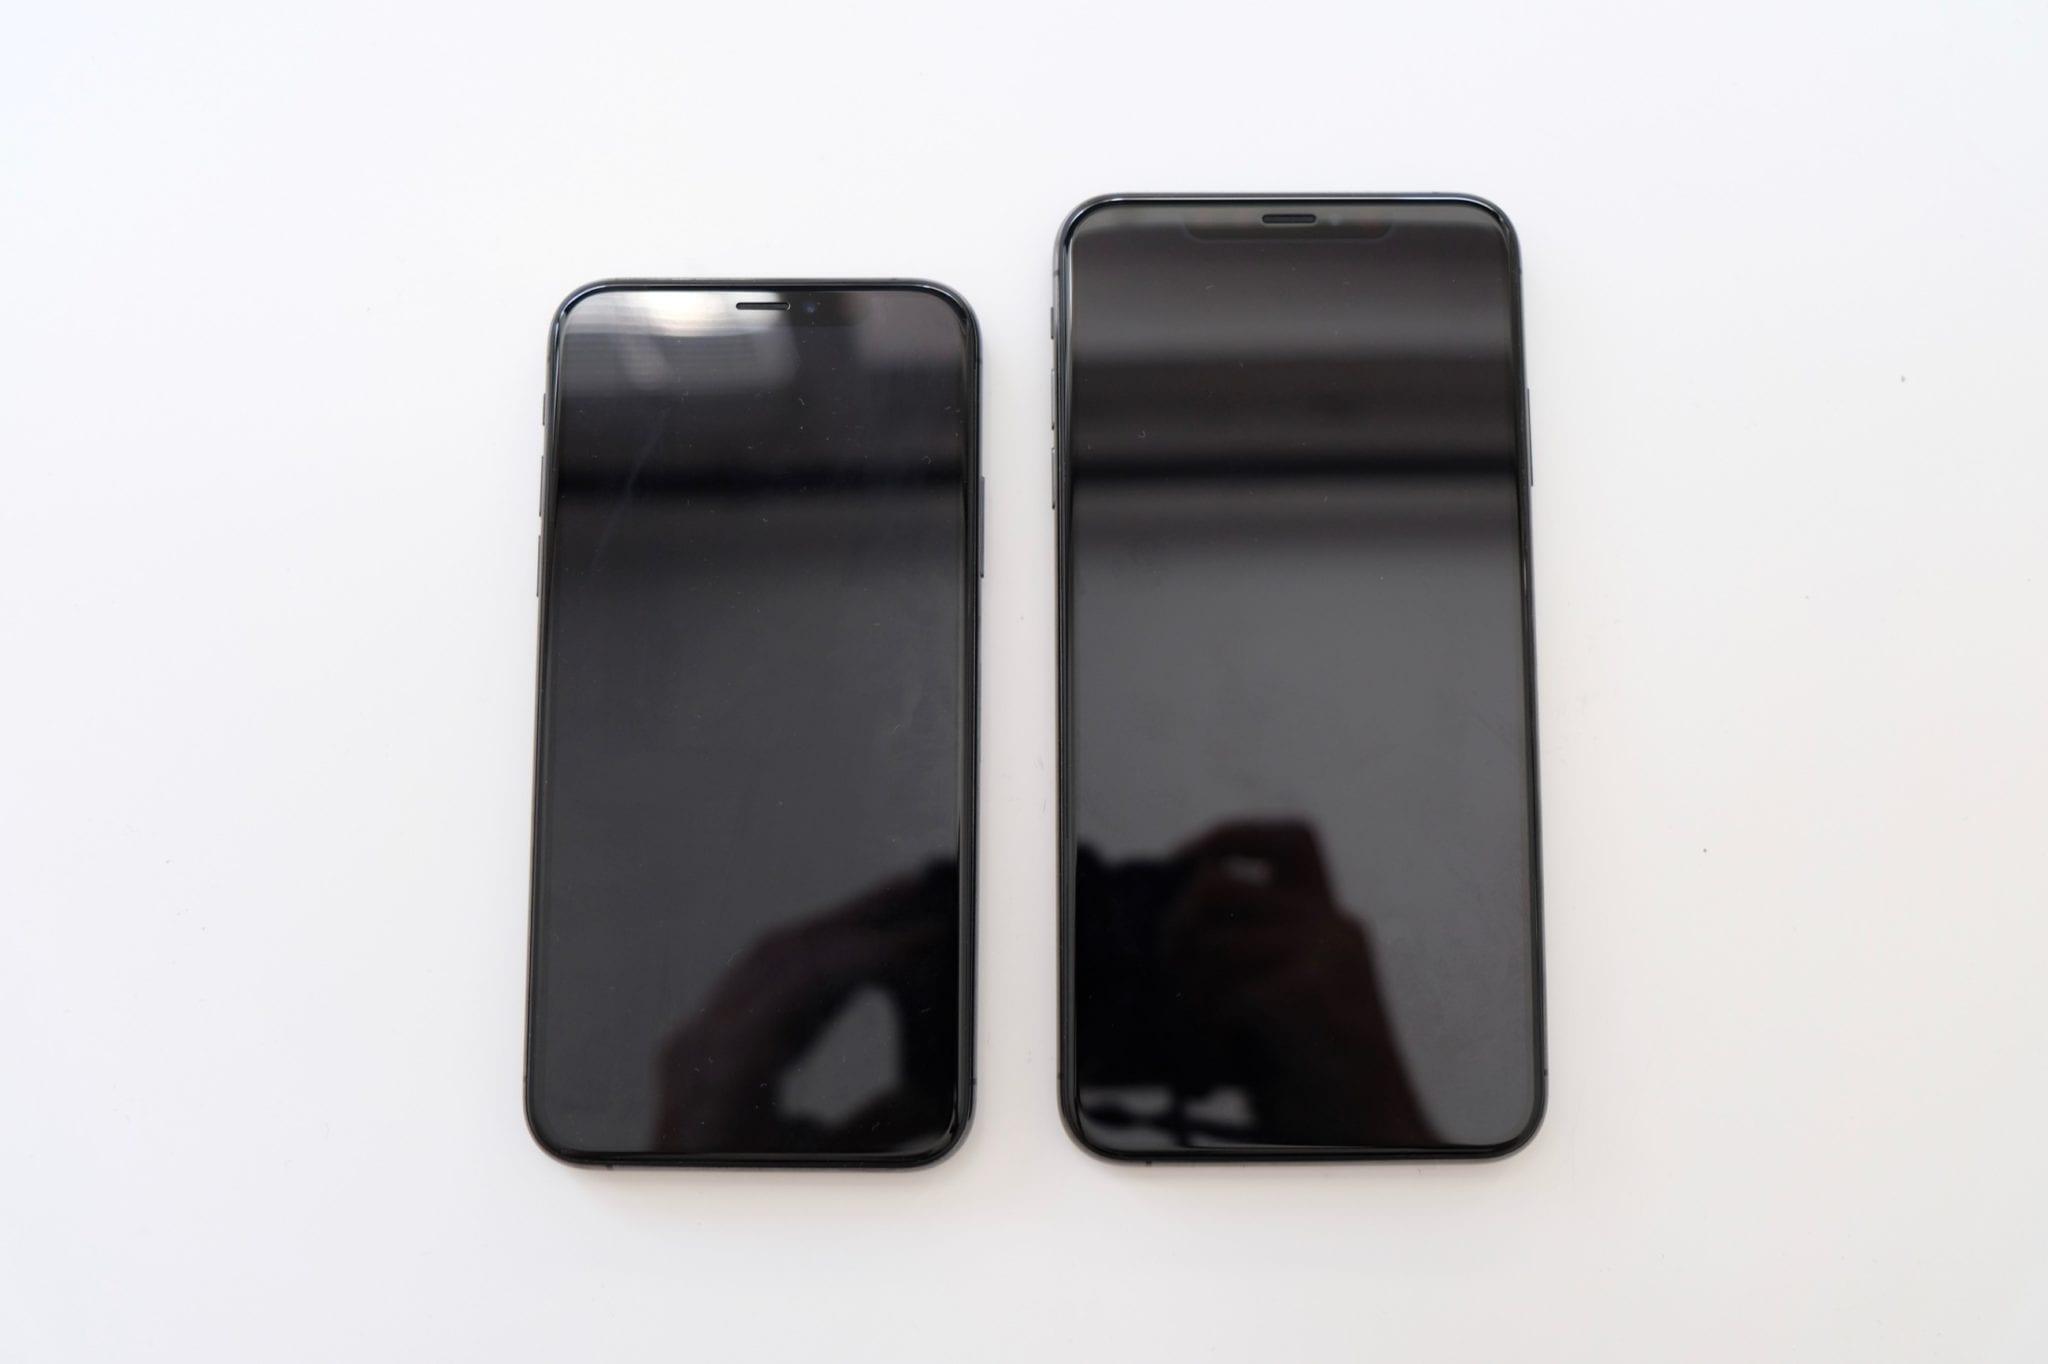 DSCF3148 - Prvé dojmy: iPhone XS a iPhone XS Max